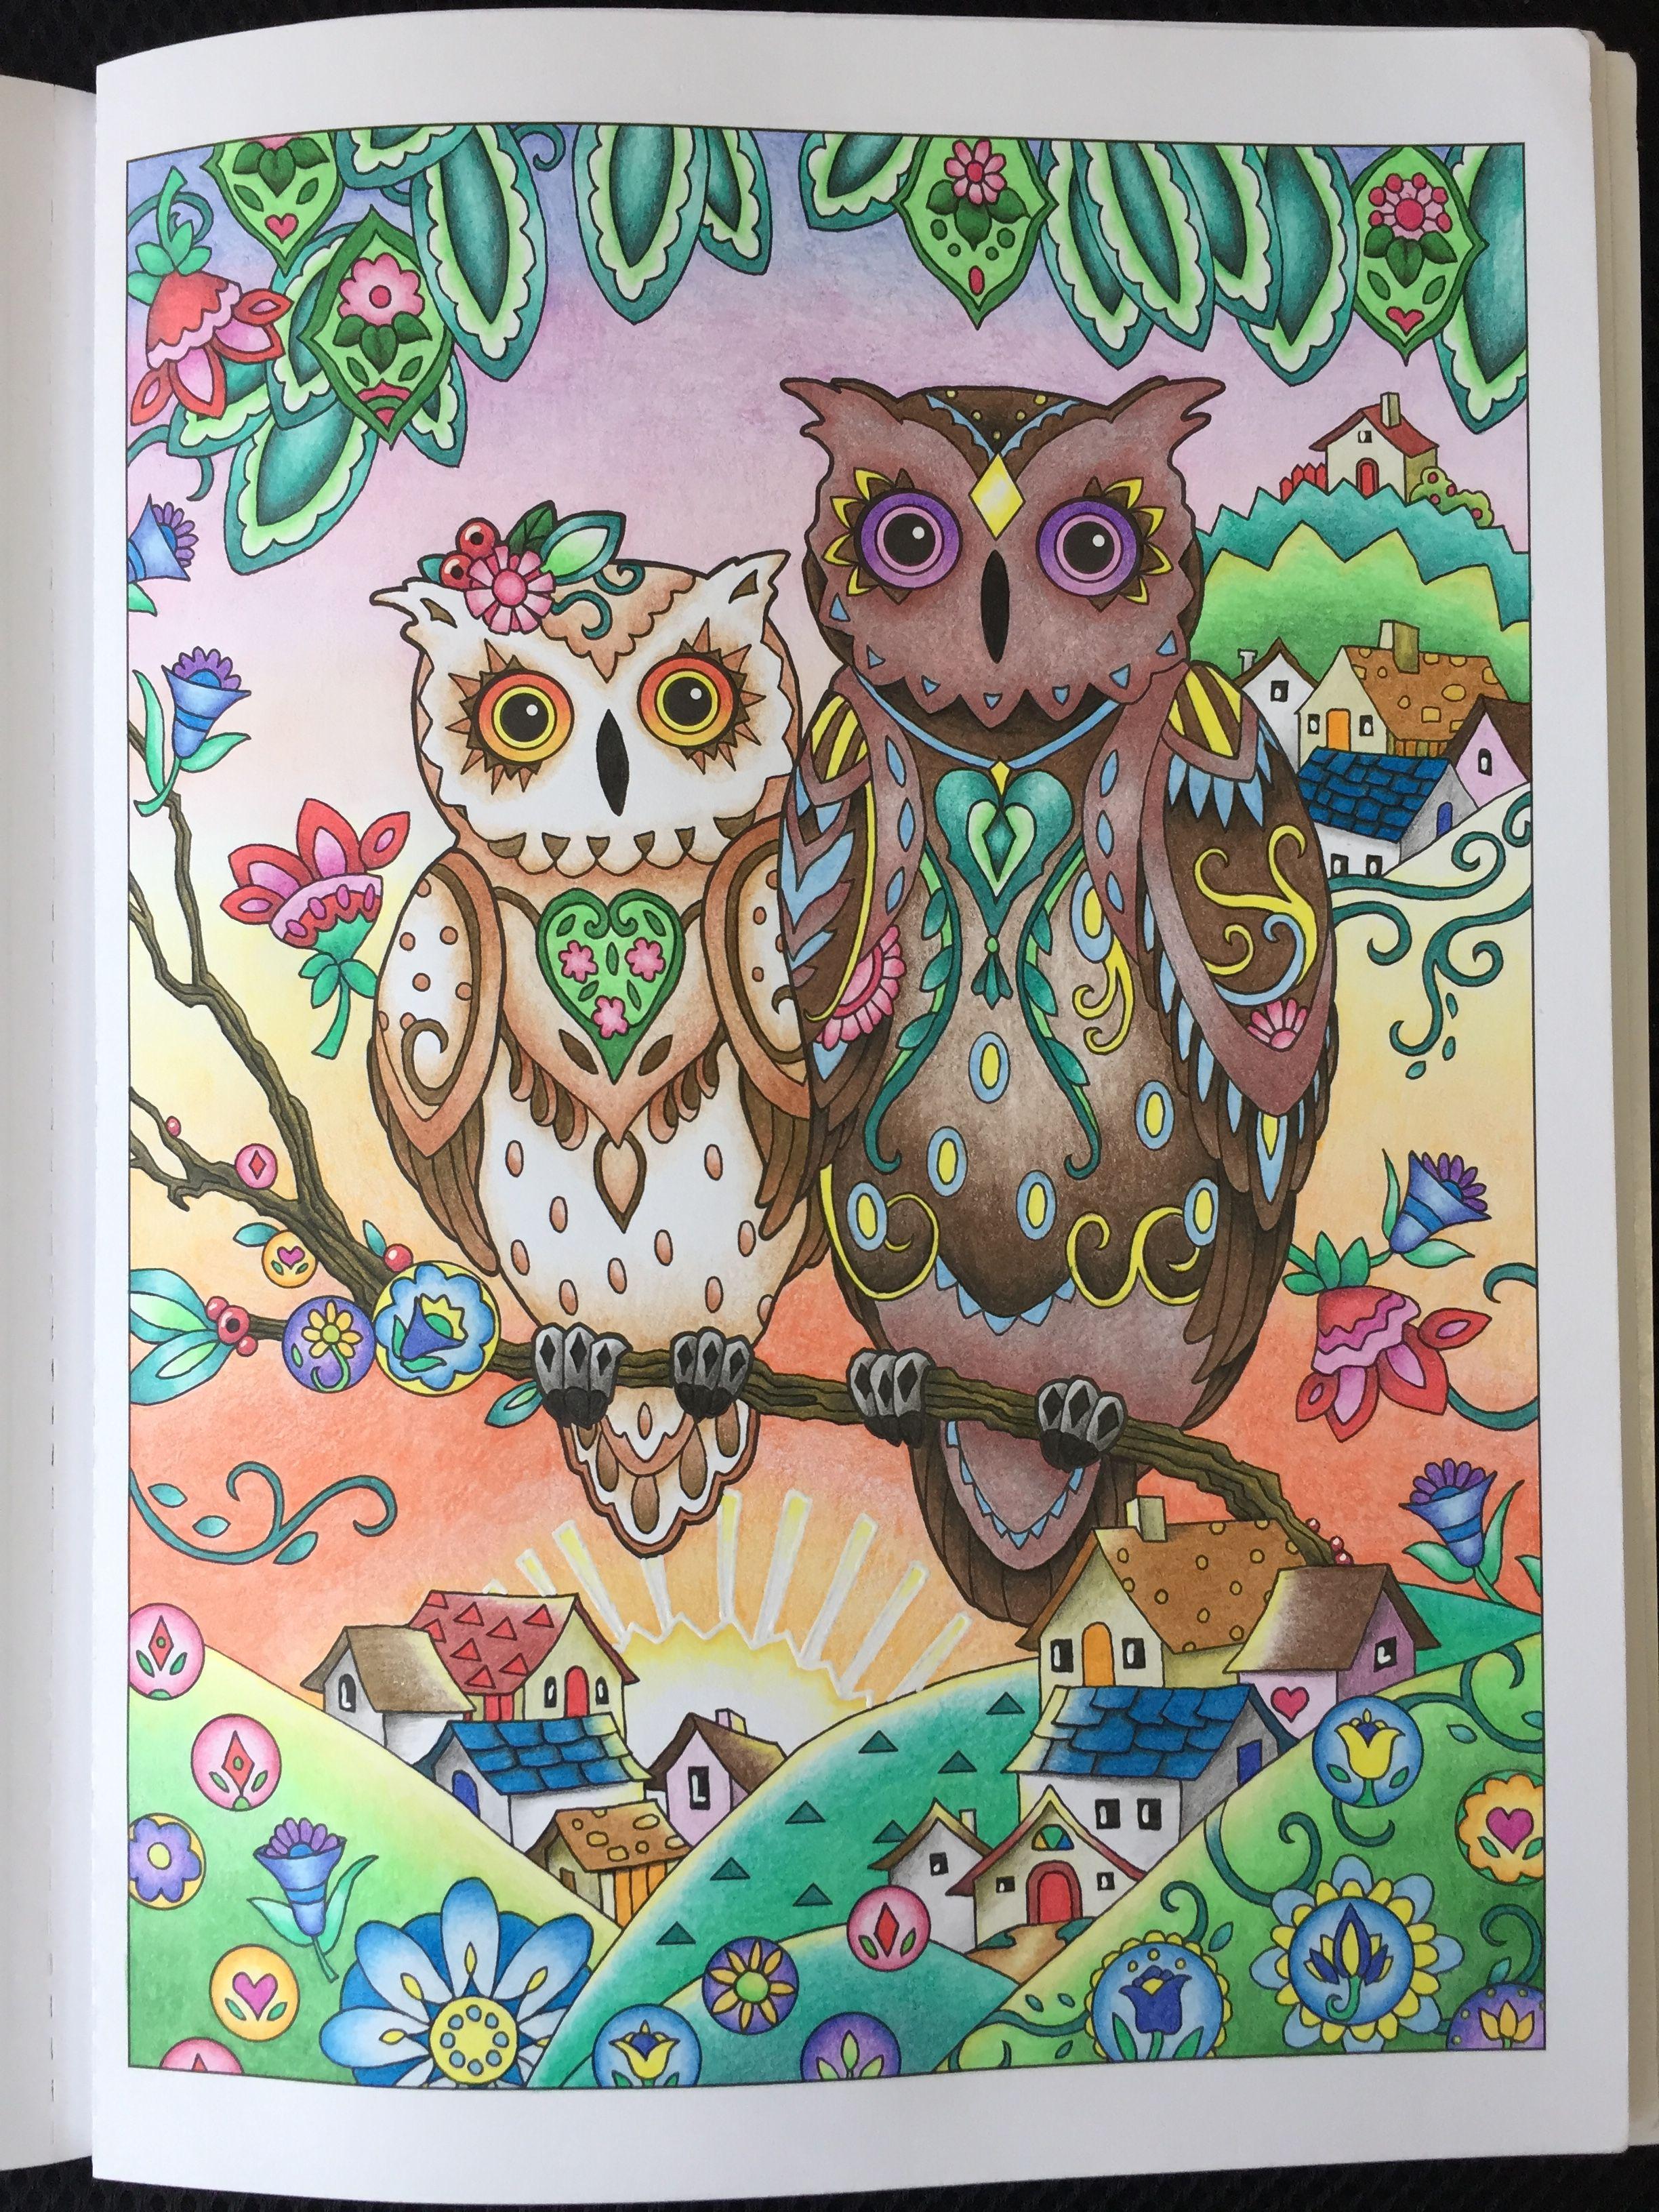 Owls Marjorie Sarnat 幸せを呼ぶフクロウ塗り絵 マージョリー